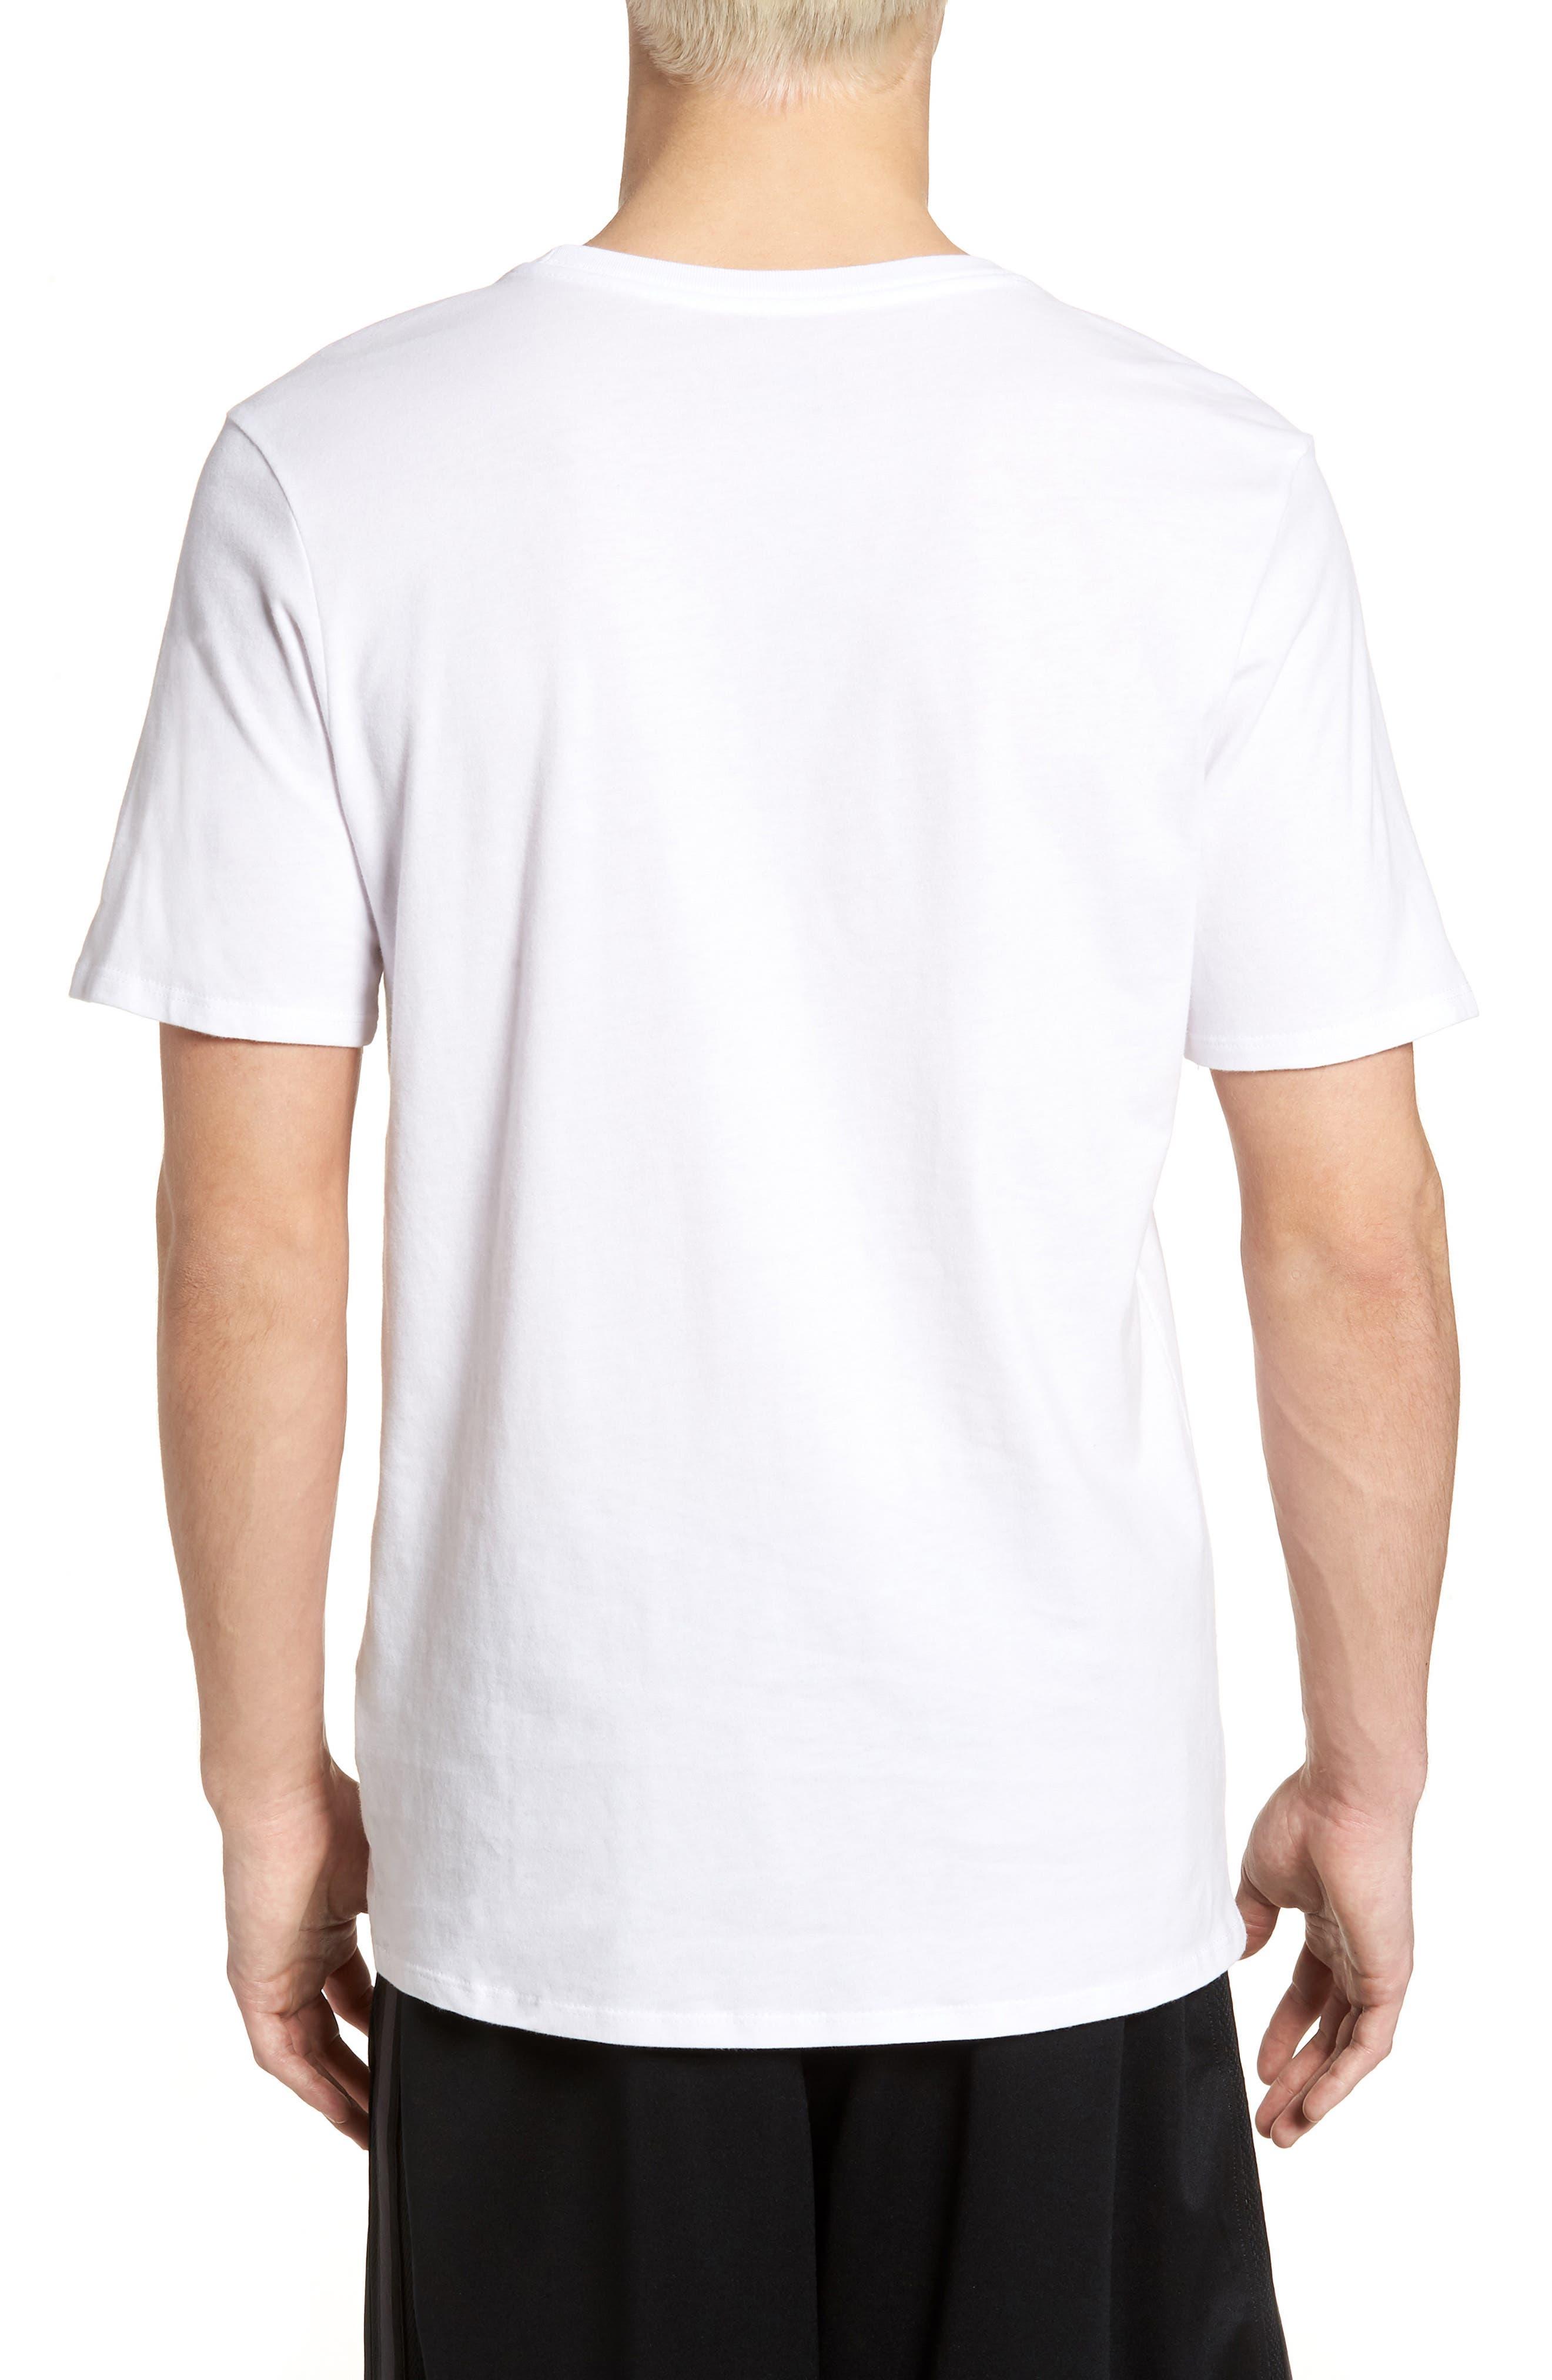 'Tee-Futura Icon' Graphic T-Shirt,                             Alternate thumbnail 24, color,